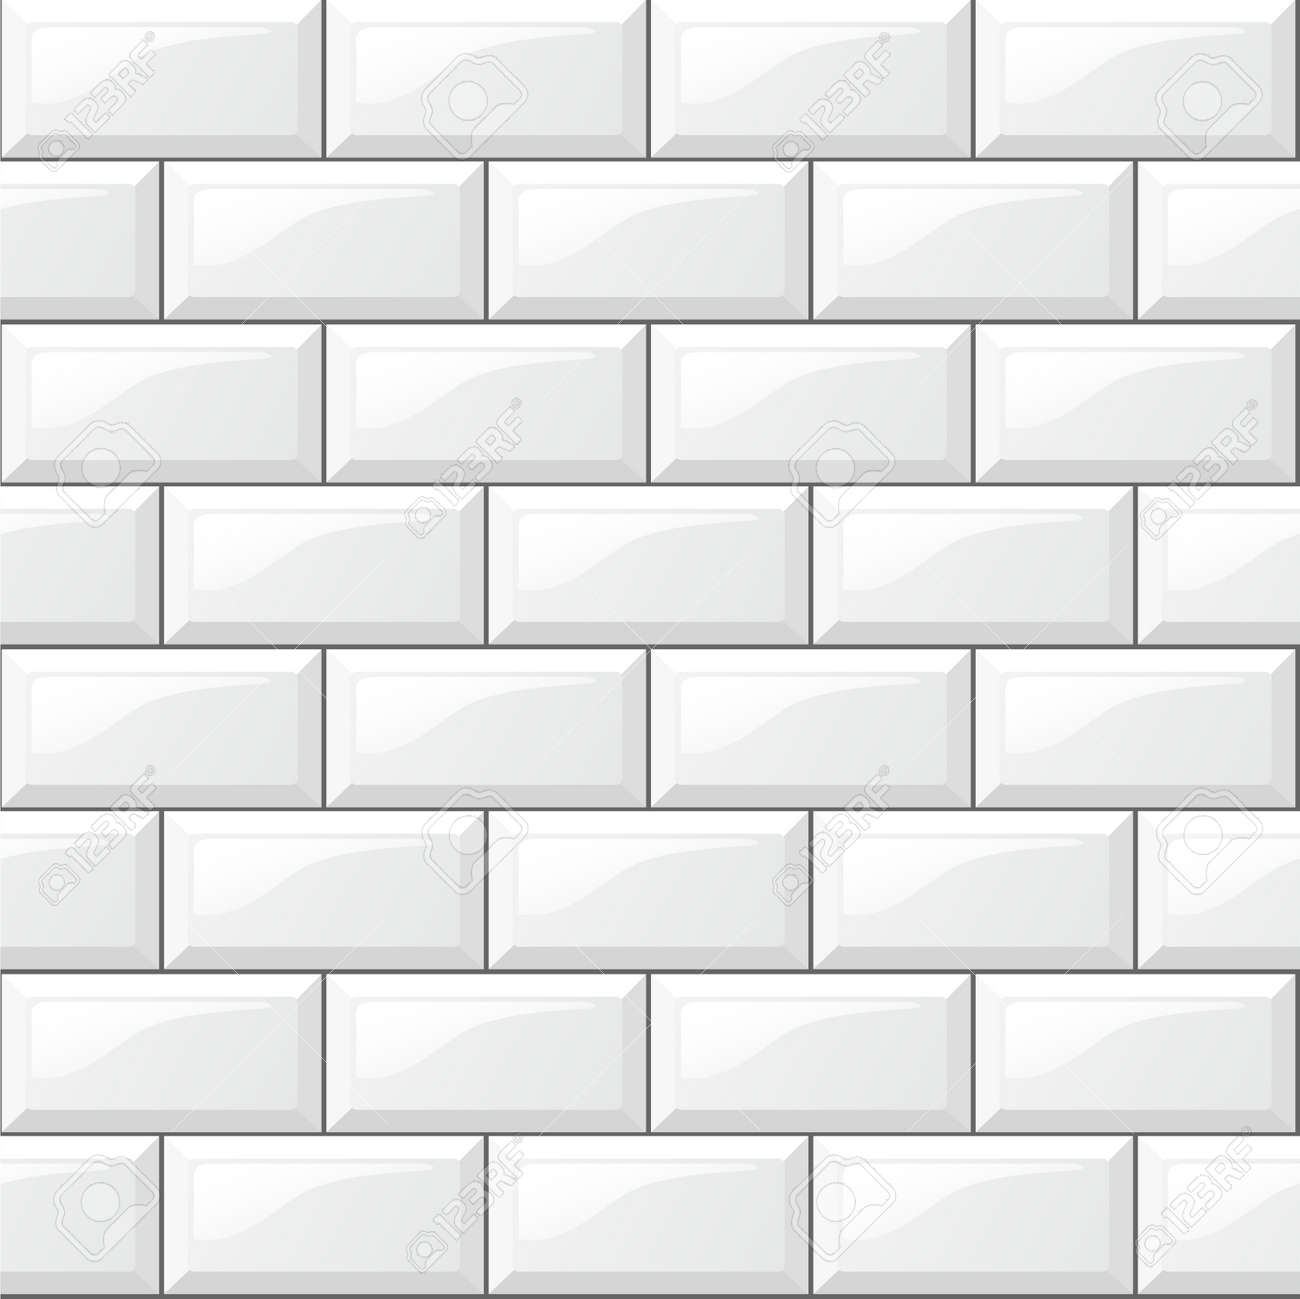 Illustration of rectangular horizontal white tiles background - 66275129